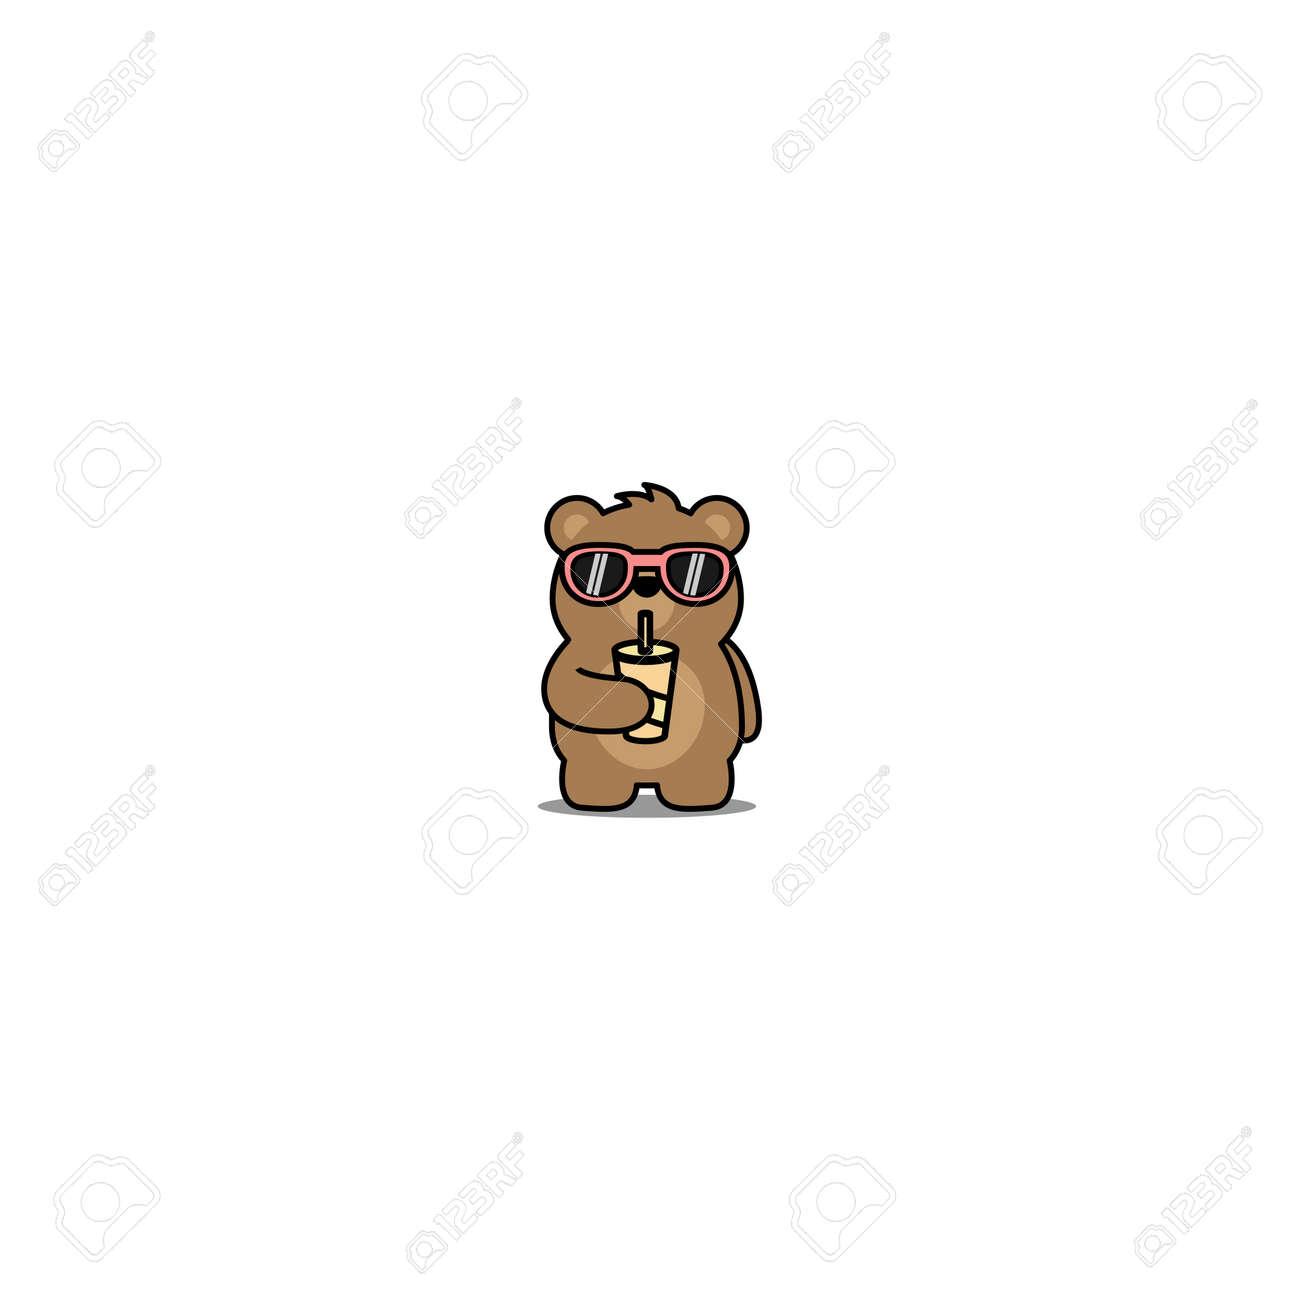 Cute bear with sunglasses drinking water cartoon, vector illustration - 164045059